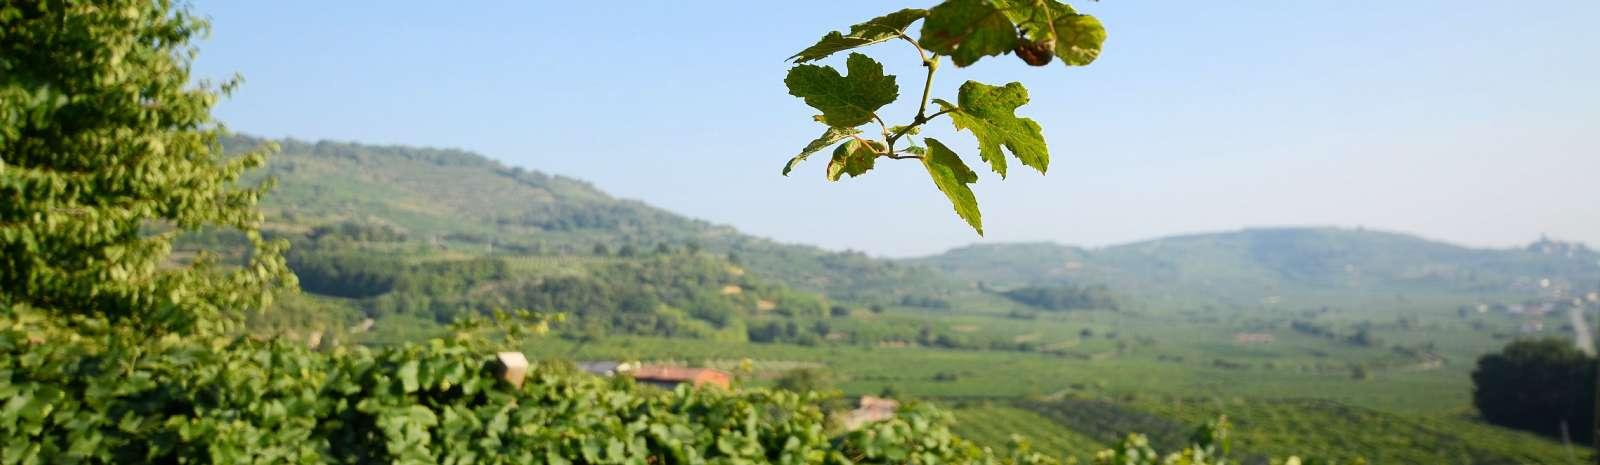 Les douces collines de la Valpolicella